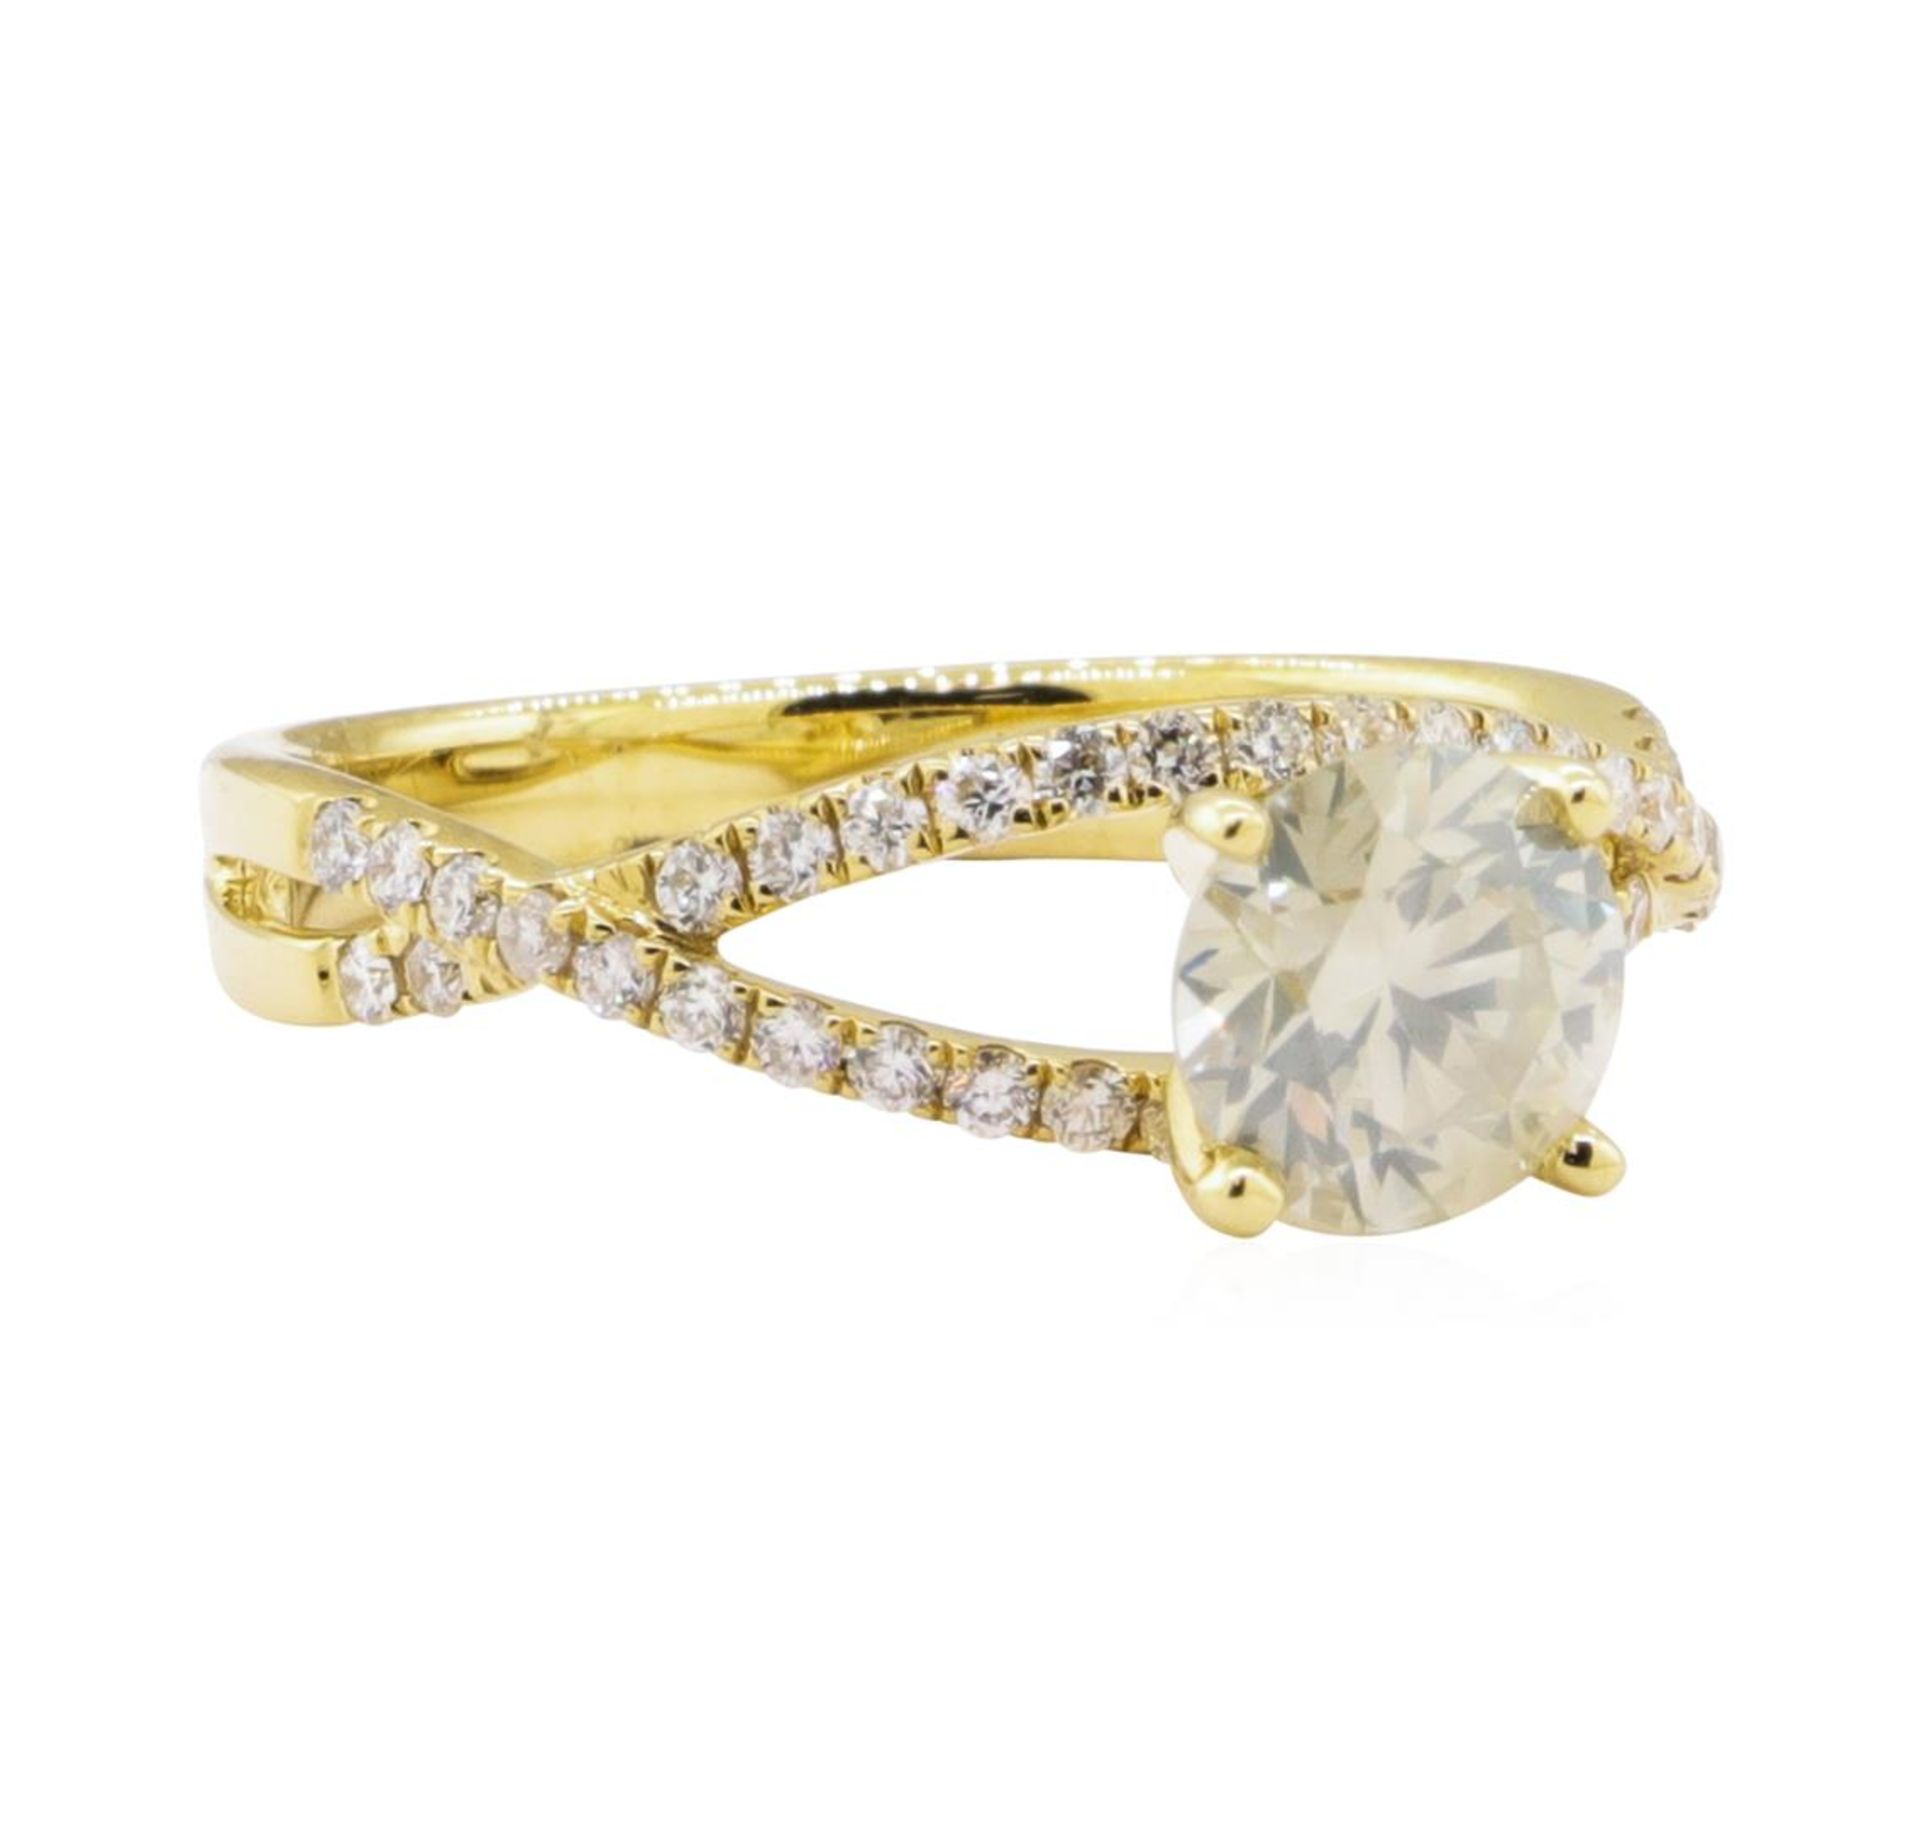 1.04ct Diamond Ring - 18KT Yellow Gold